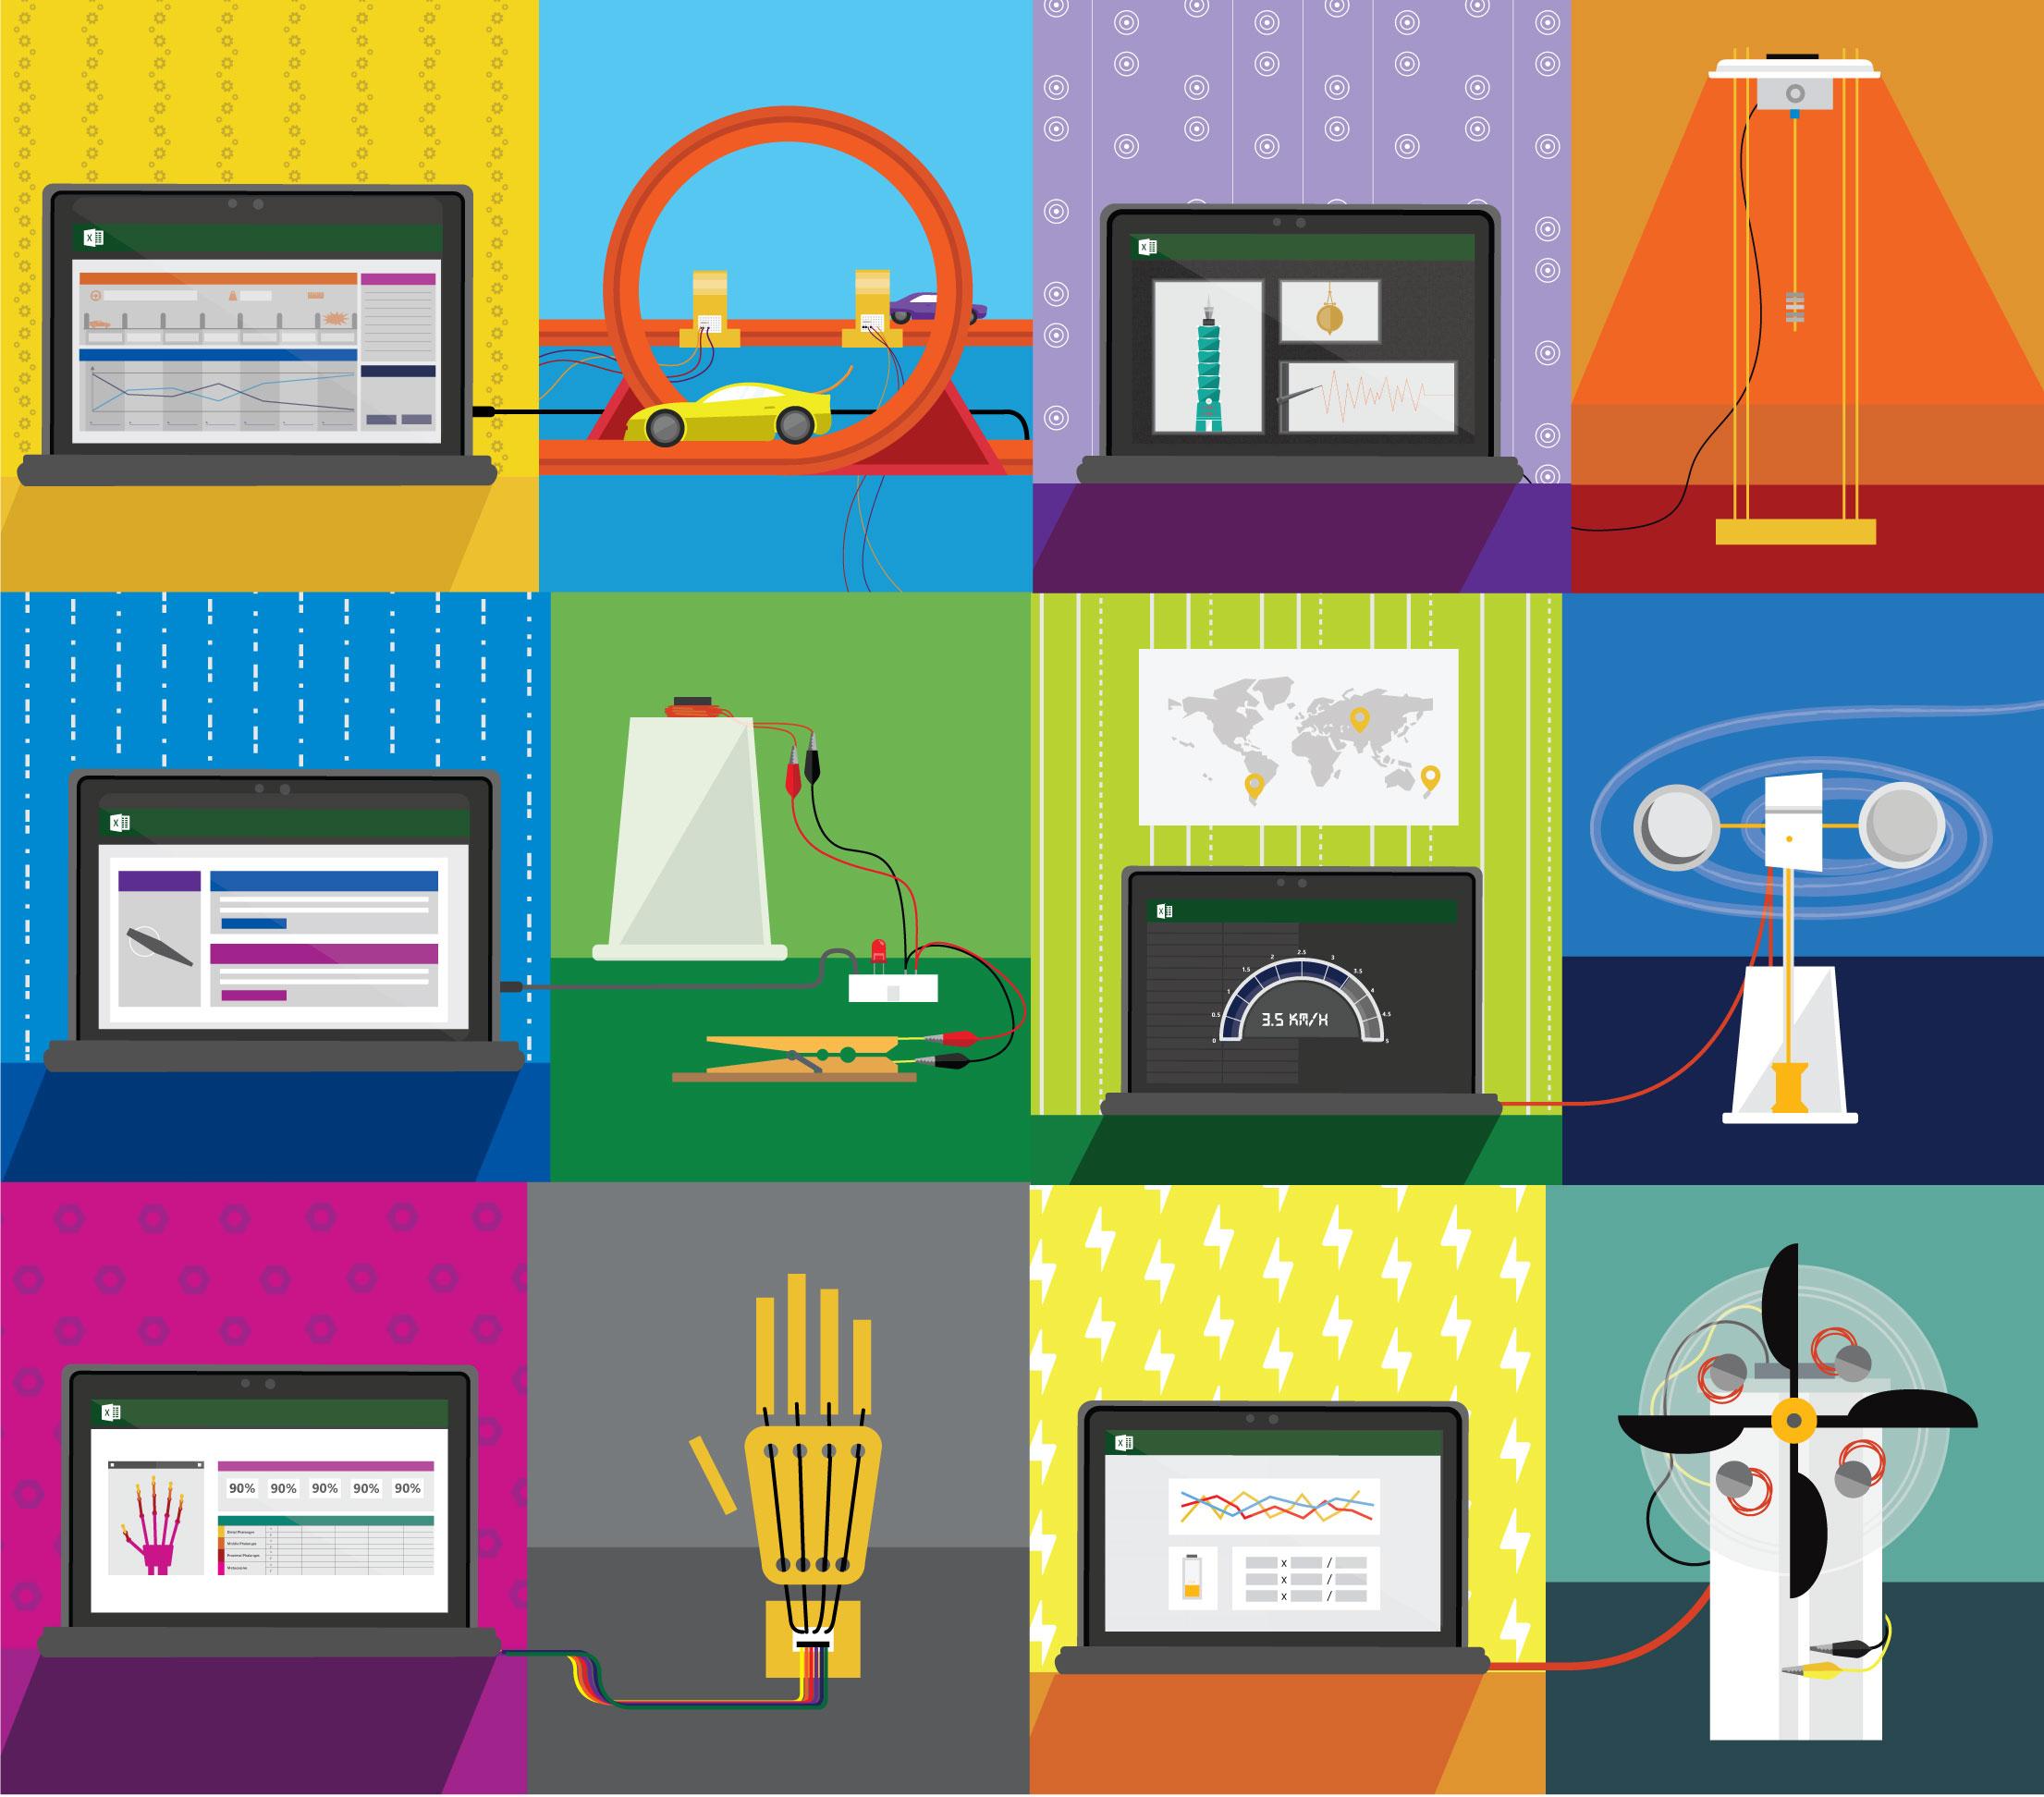 Hacking STEM Project Illustrations